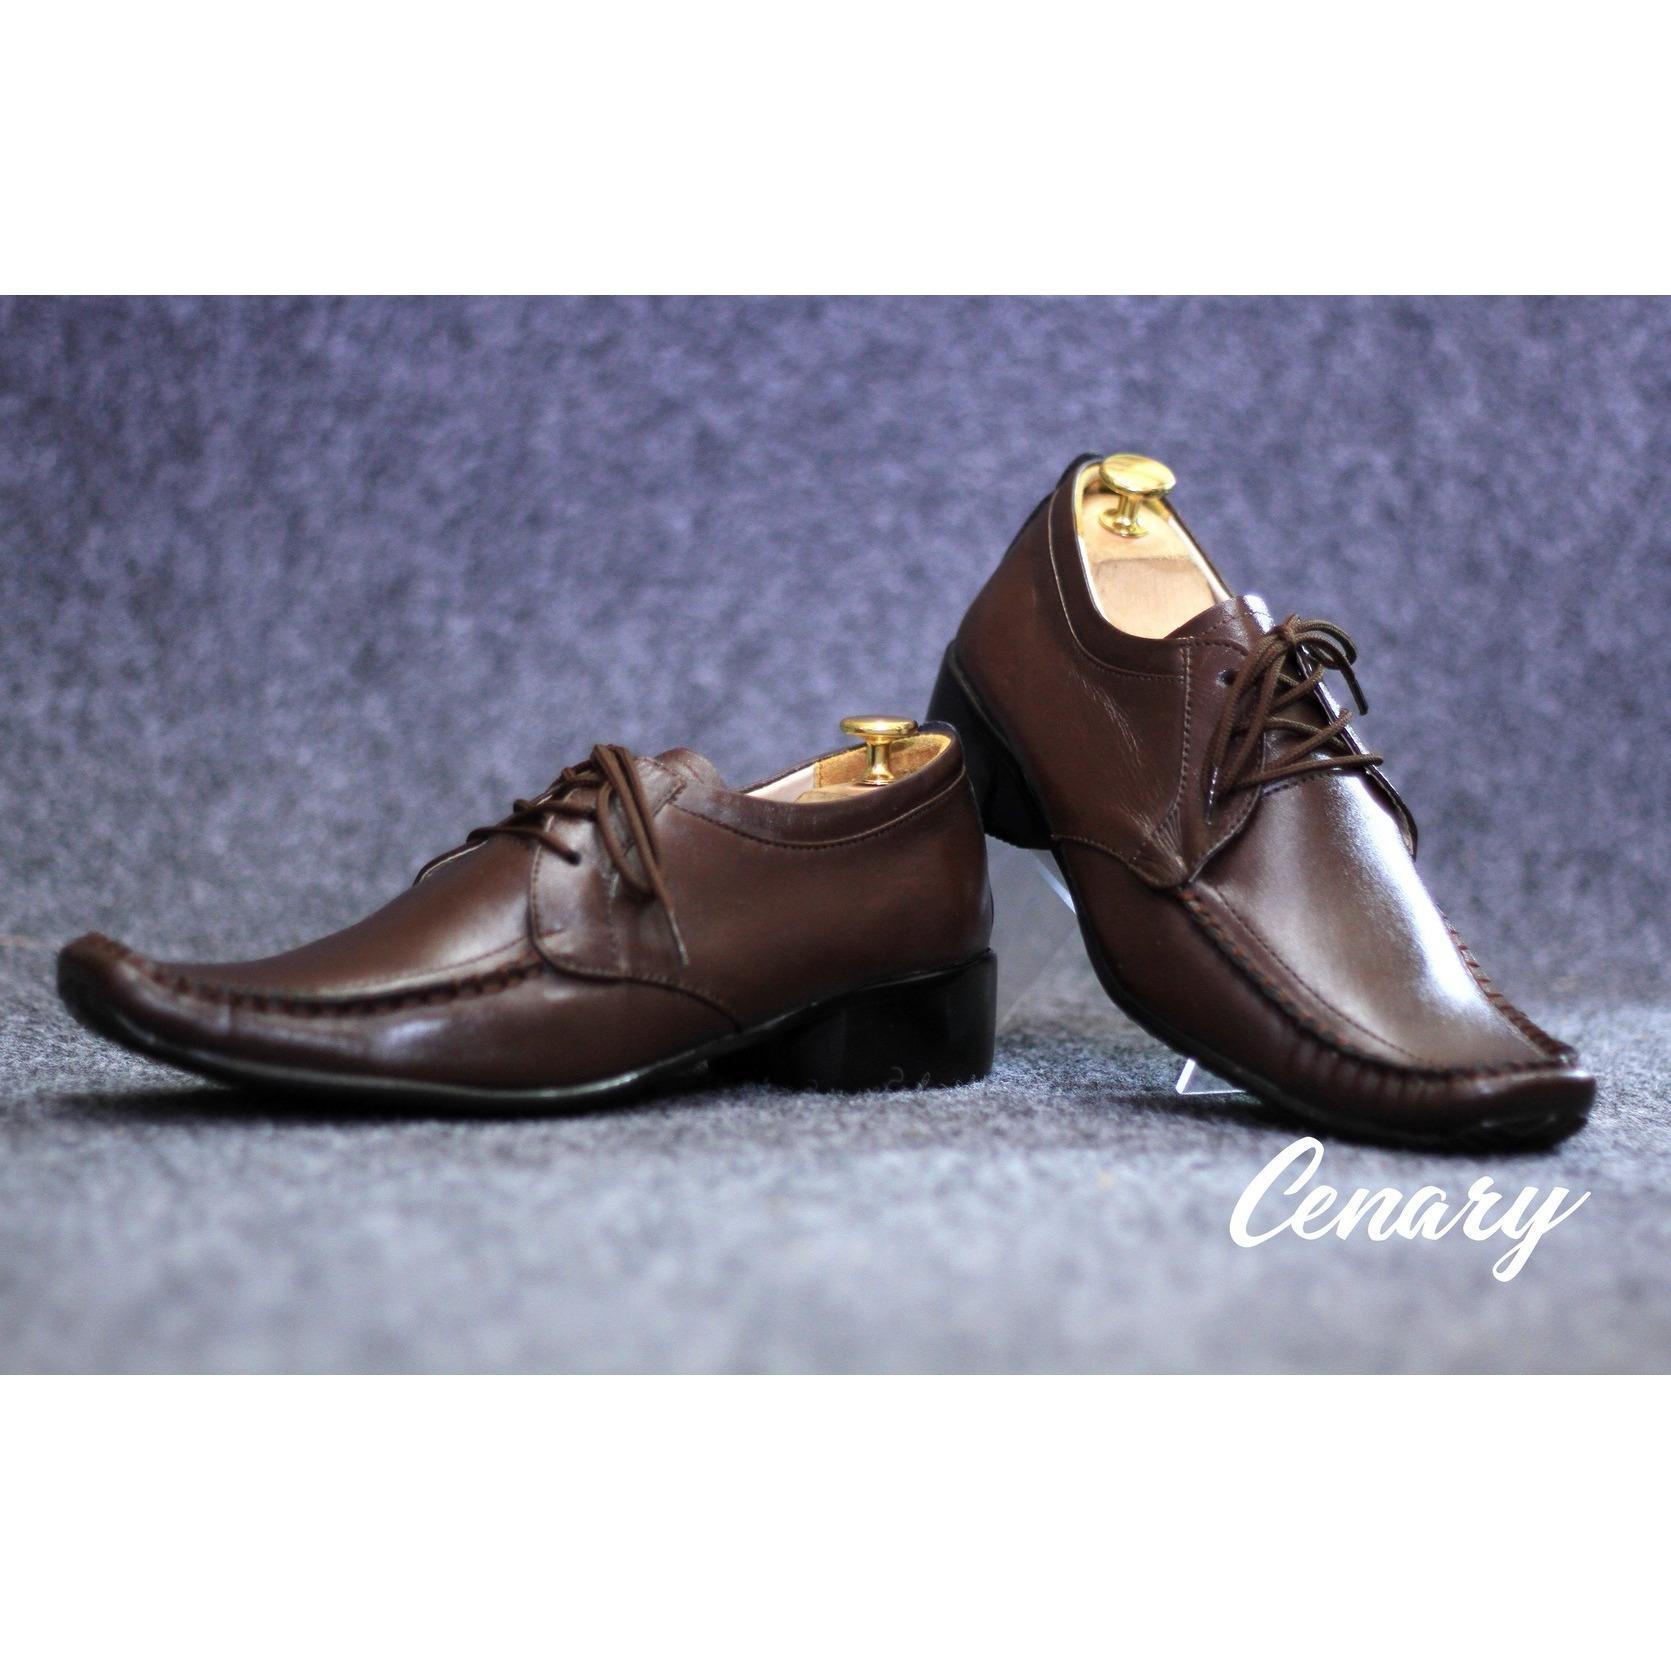 YAHLAMU - Sepatu Pantofel Formal Kulit CVNY ALAN Pria / Sepatu kerja / Kickers / Bally / Yongki/ CEVANY